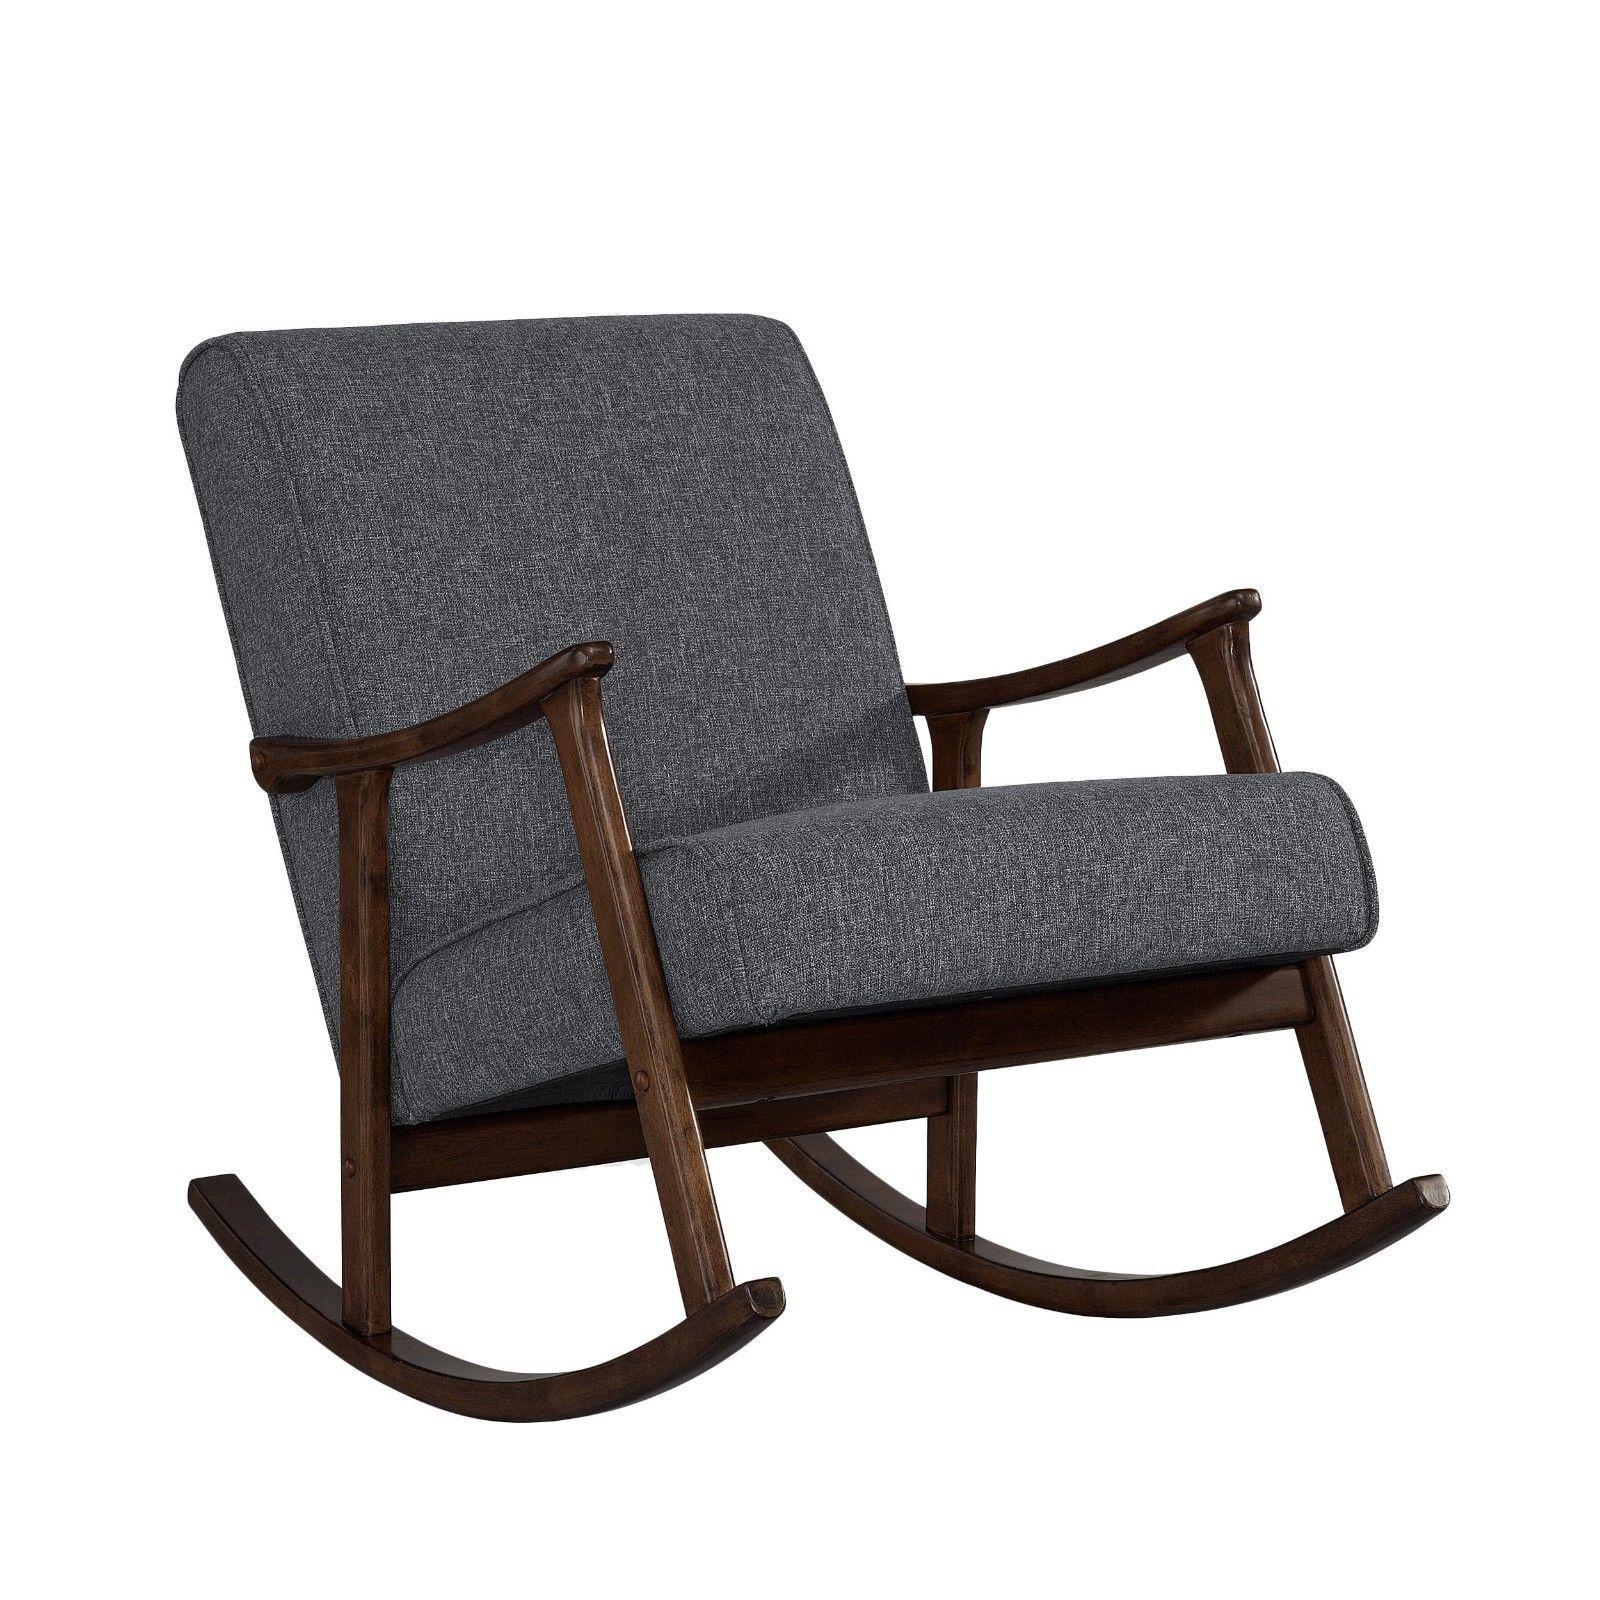 Granite grey fabric retro wooden rocker chair modern - Fabric rocking chairs living room ...